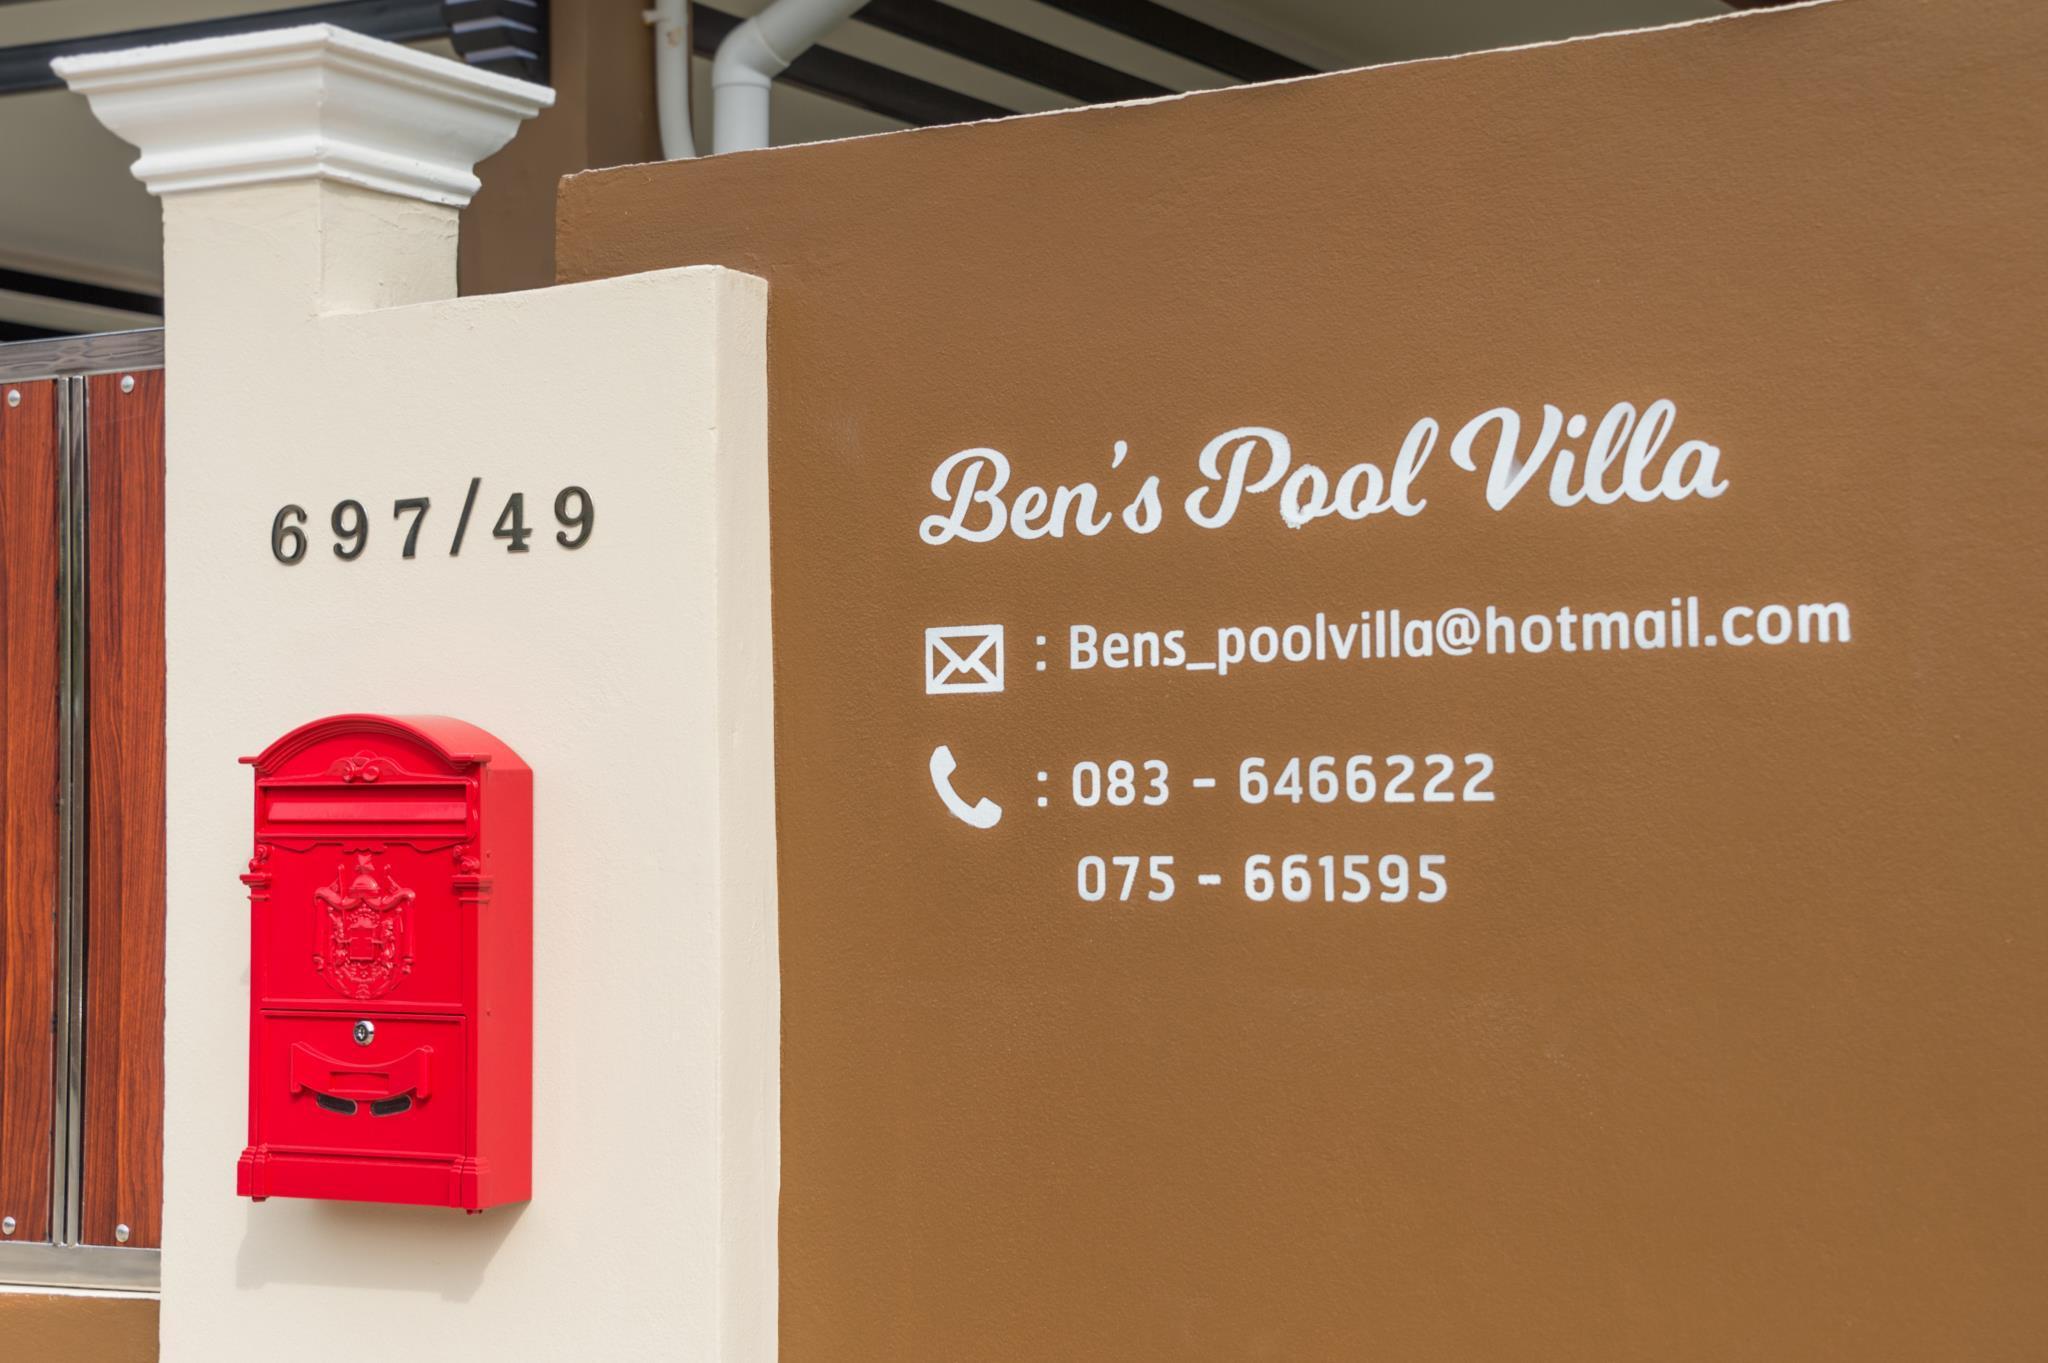 Ben's Pool Villa